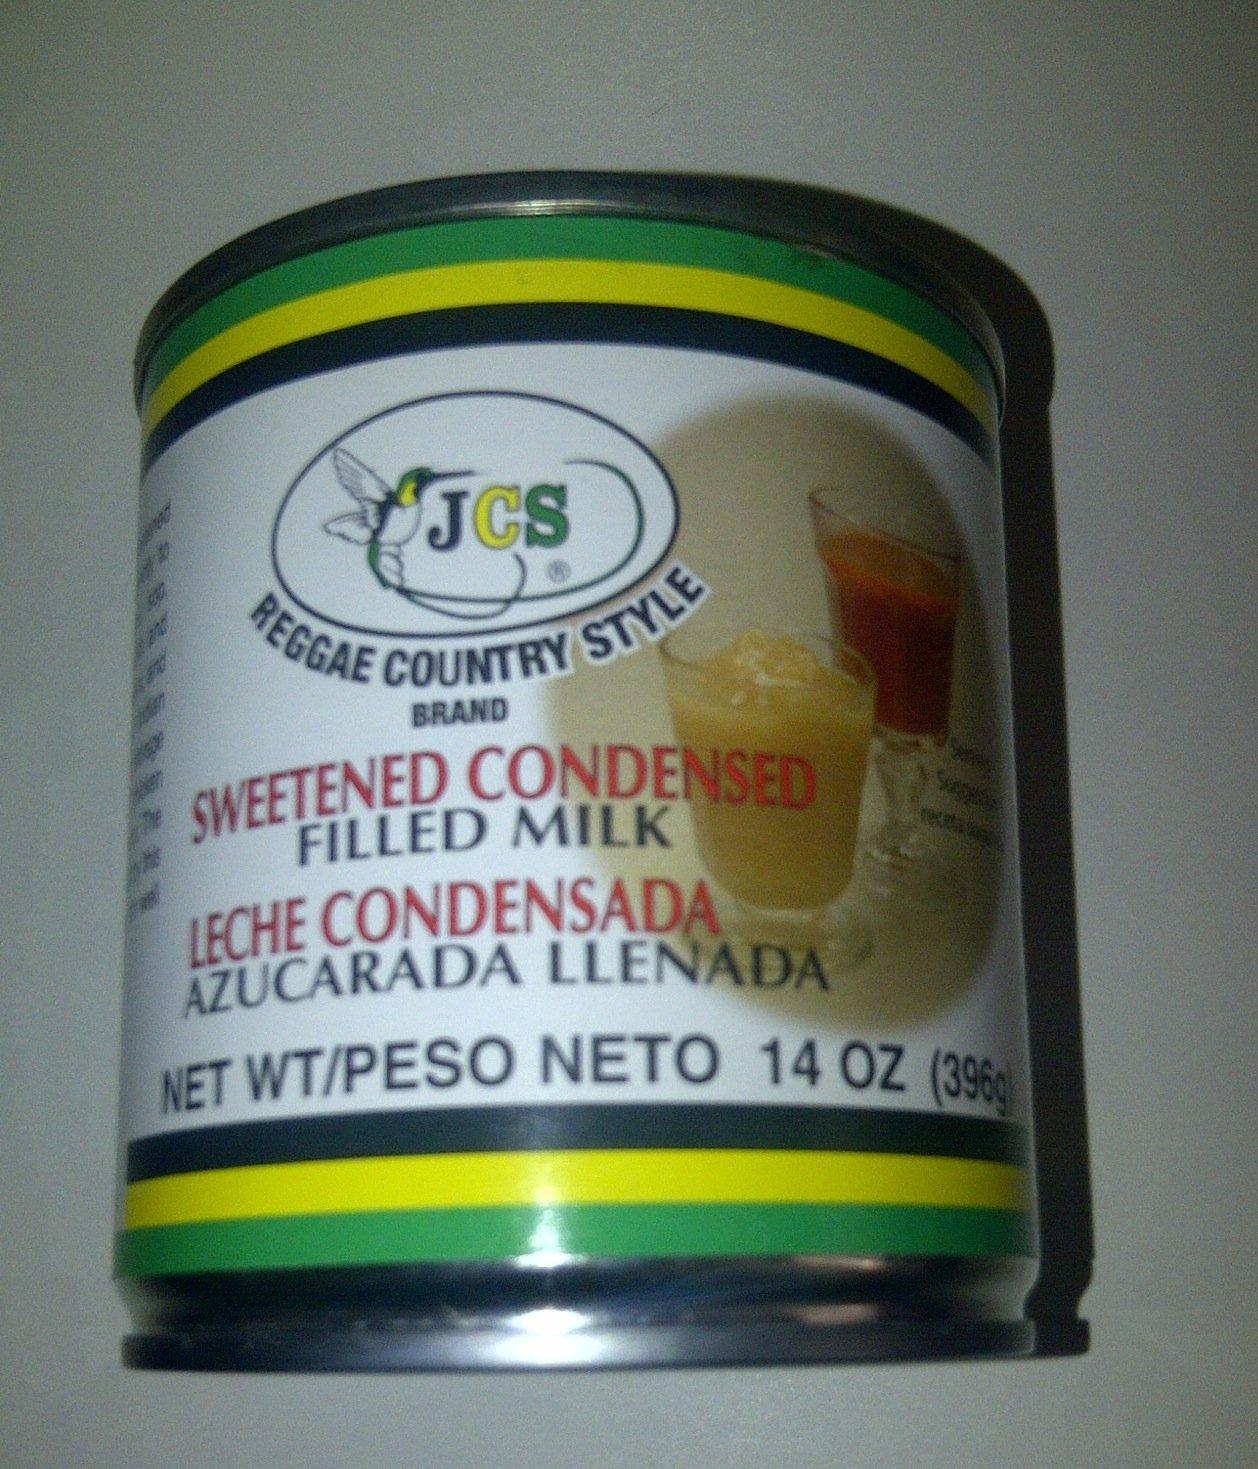 Amazon.com : JCS Sweetened Consensed Filled Milk 14 Oz(leche ...